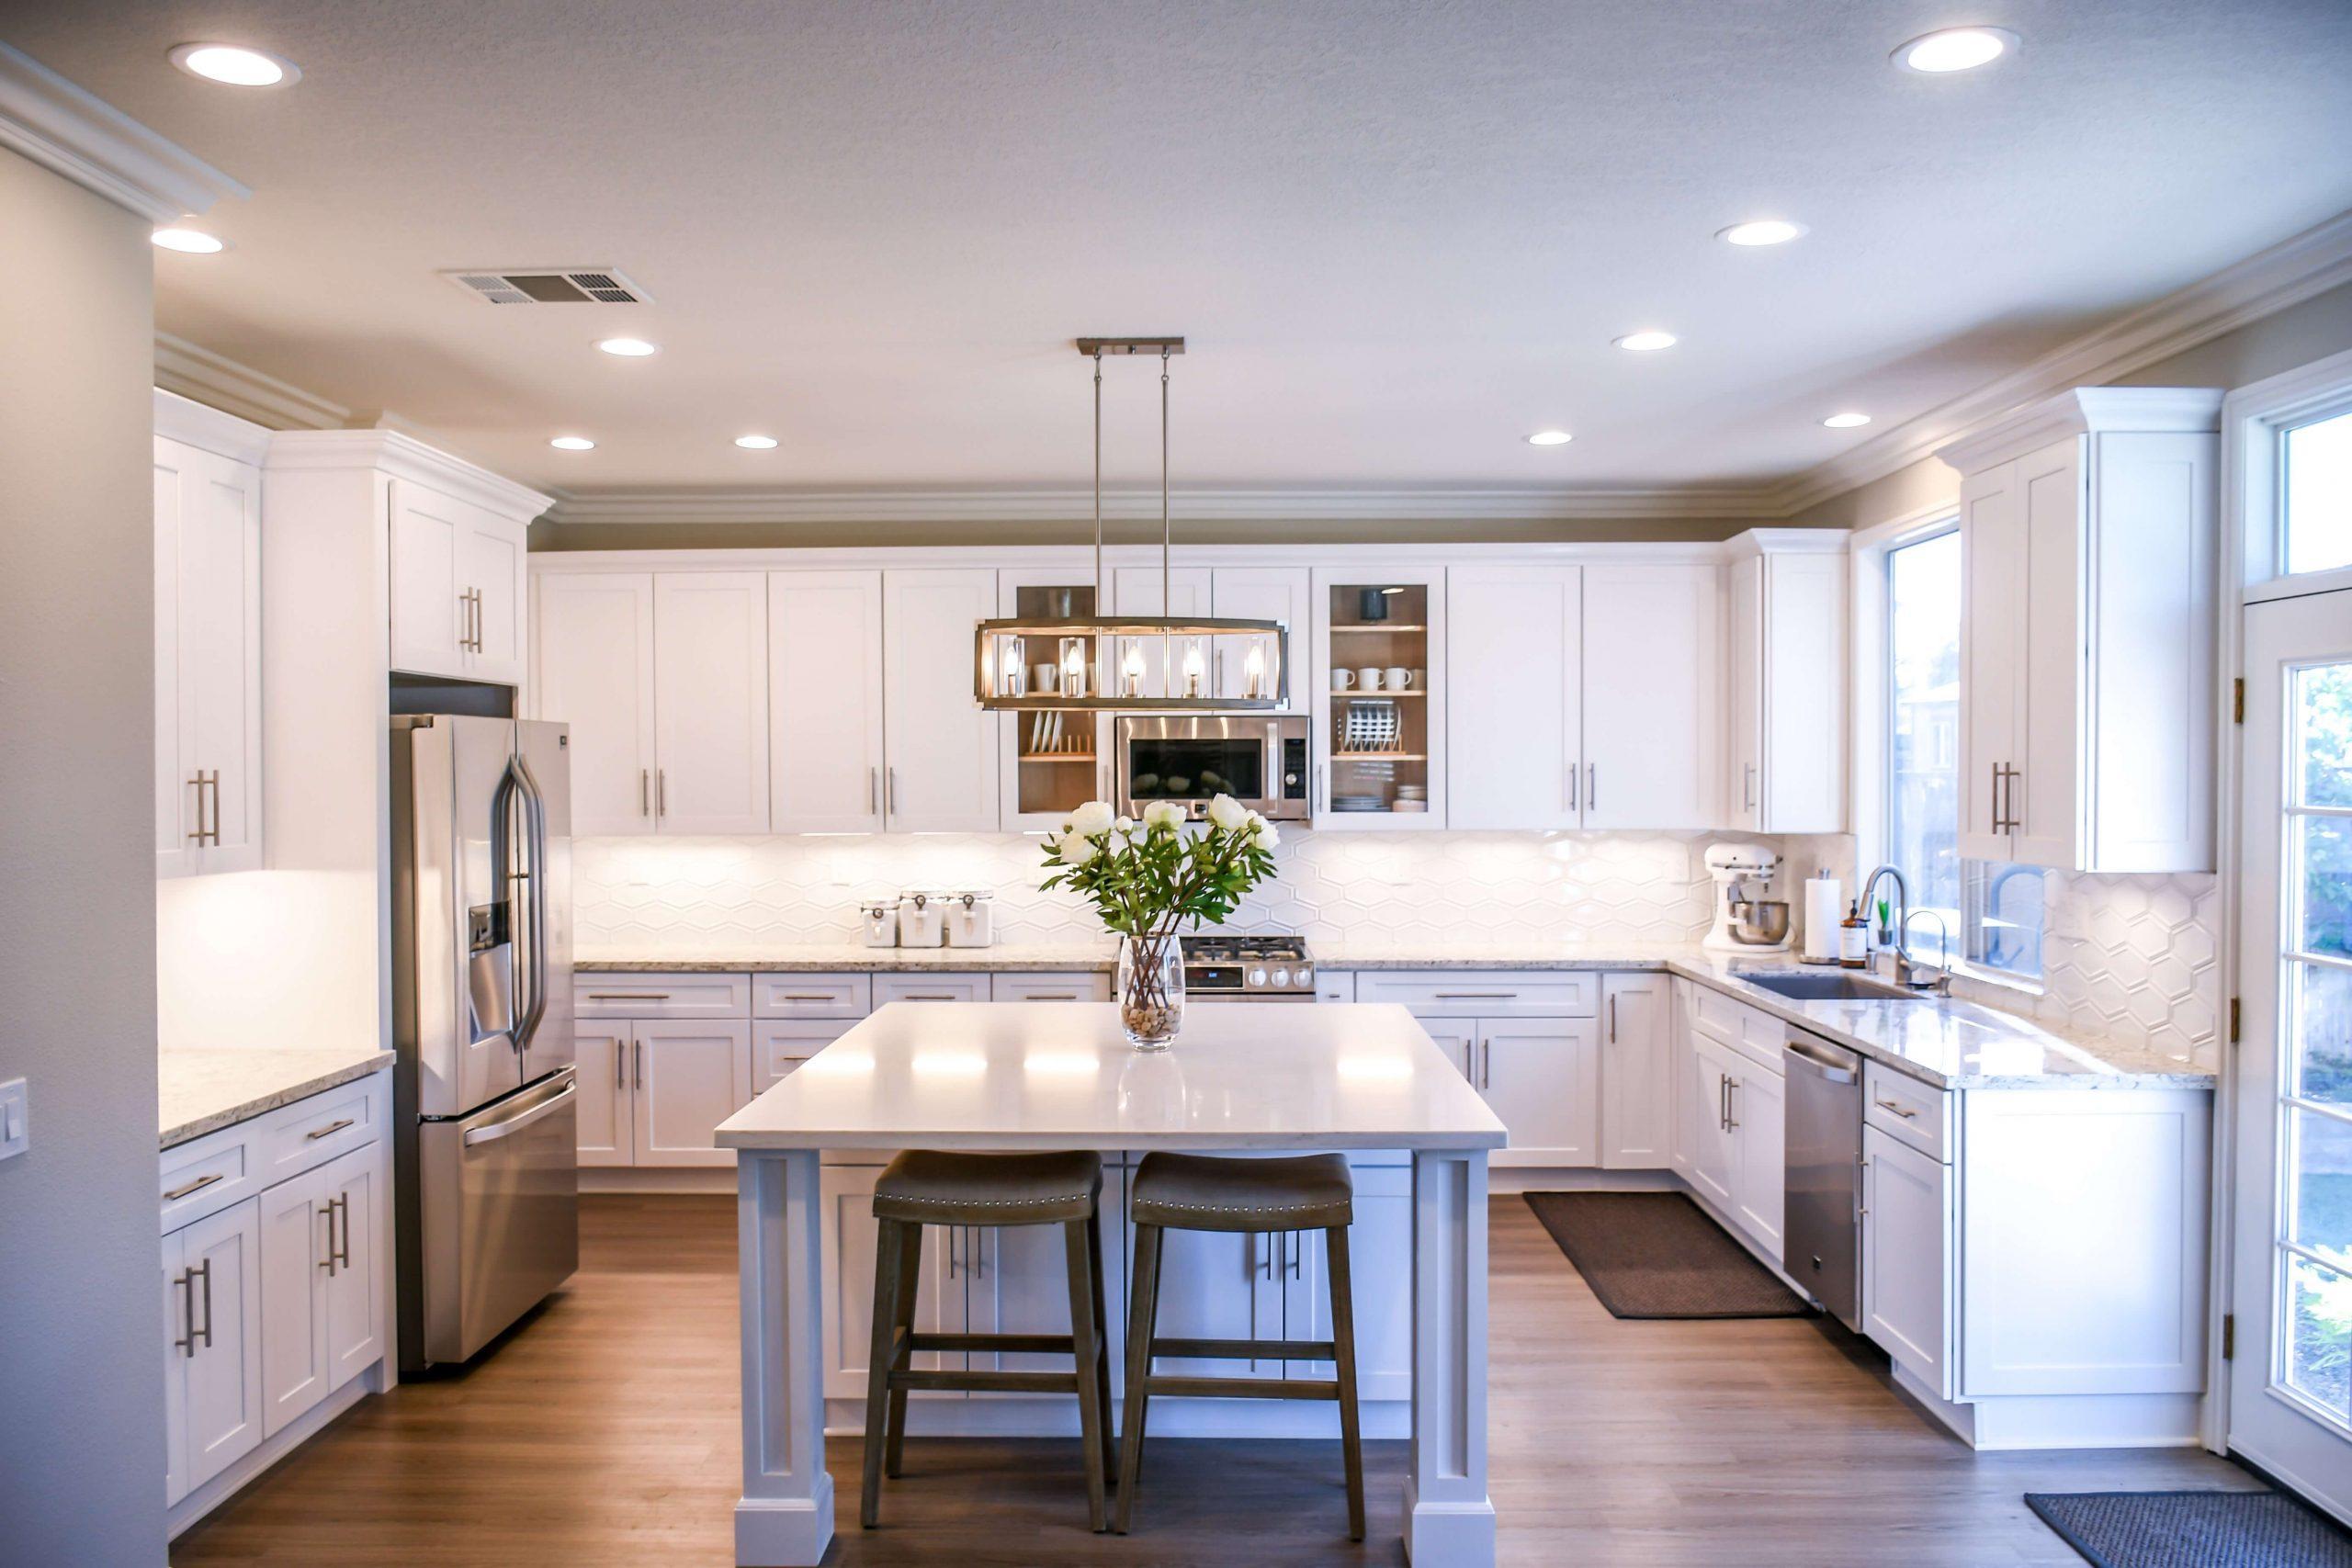 Kitchen Cabinet Refacing Jacksonville • Patio Ideas